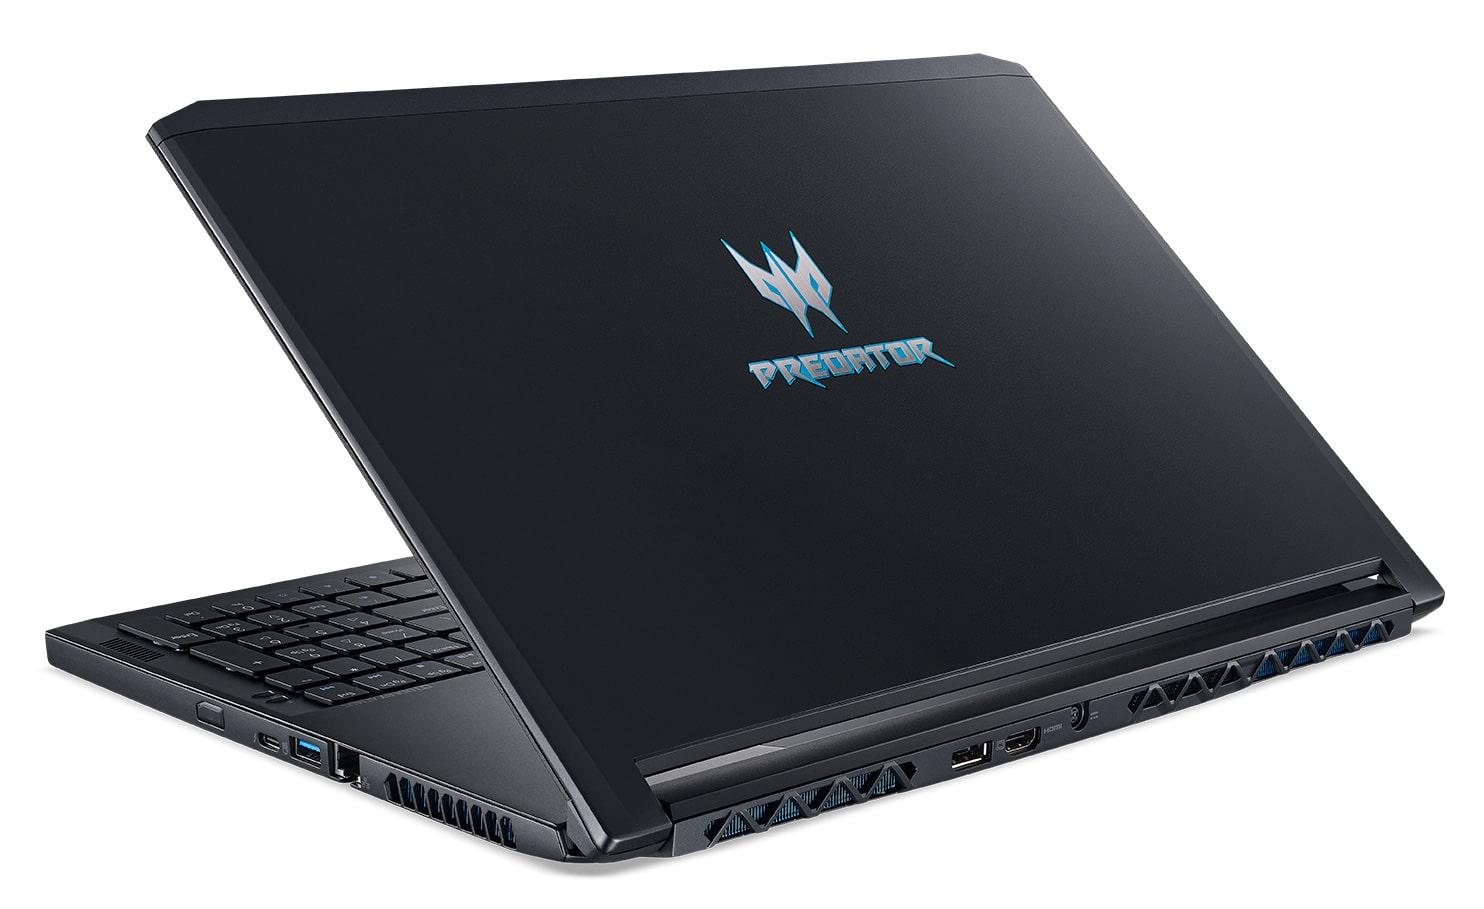 Acer Triton PT715-51-709K, Ultrabook gamer 120Hz GTX 1080 (1999€)